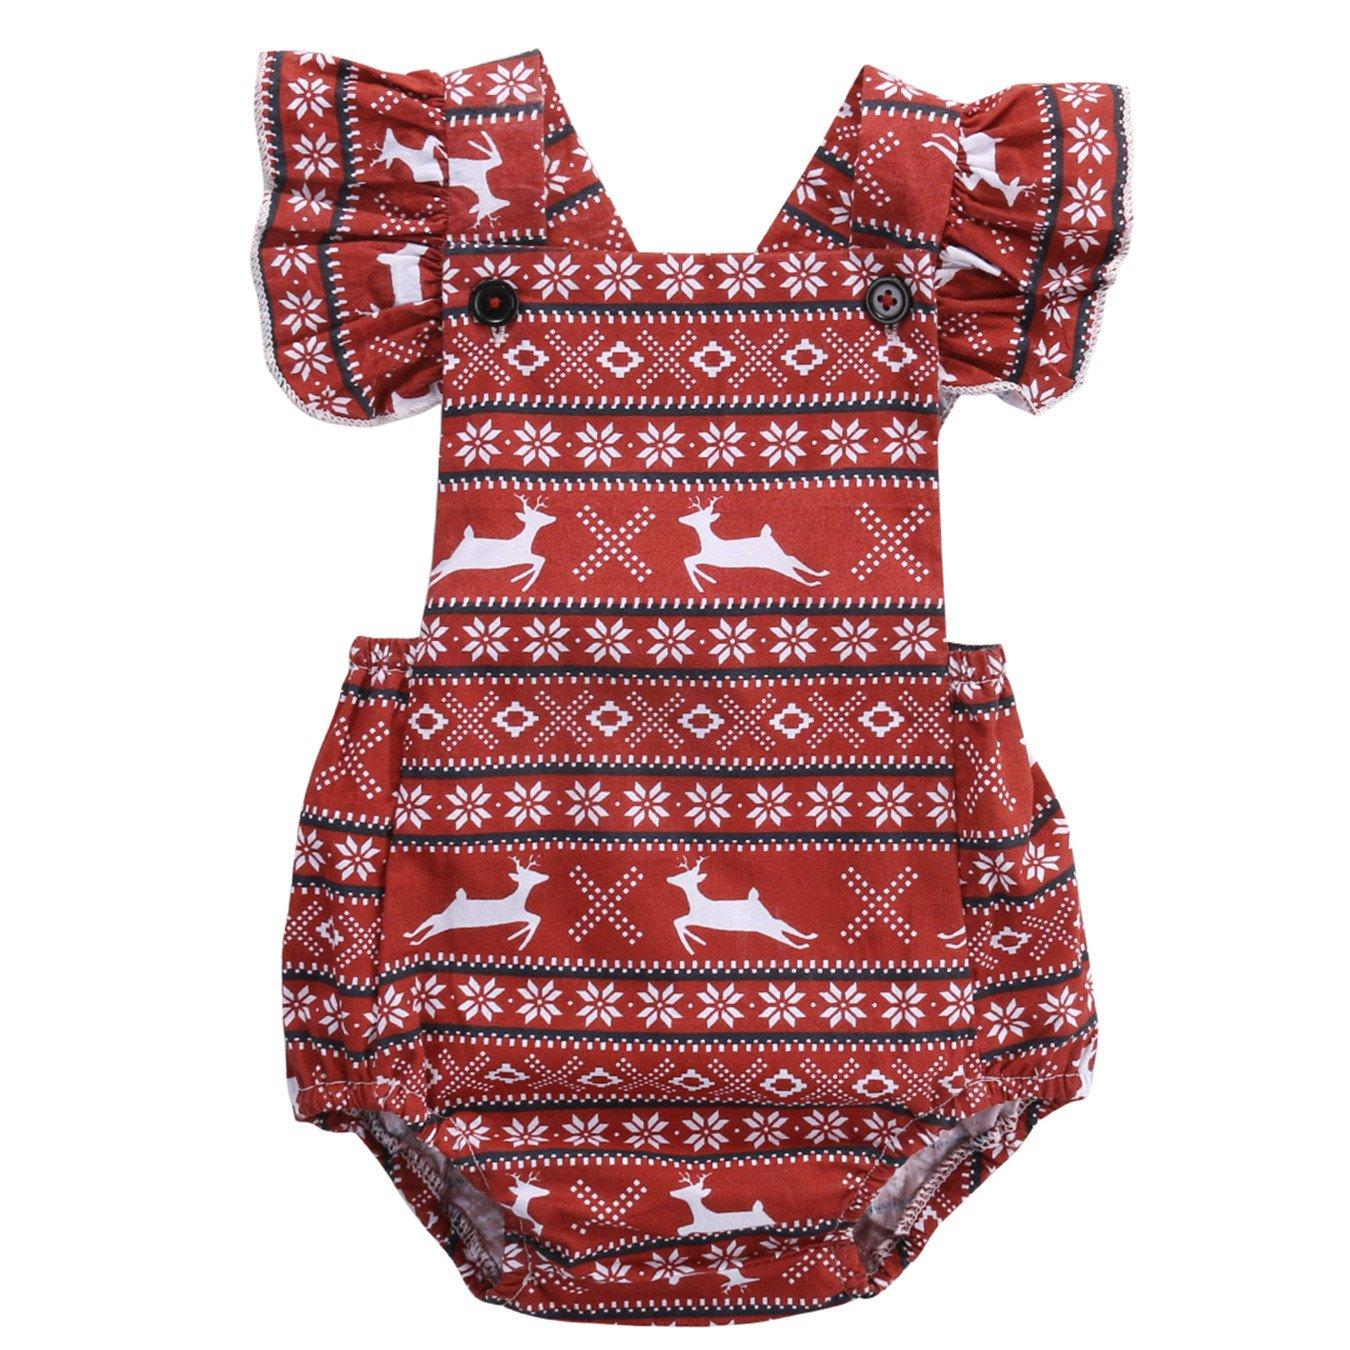 Toddler Baby Girl Deer Ruffles Deer Romper Jumpsuit Outfits Sunsuit Christmas Gift